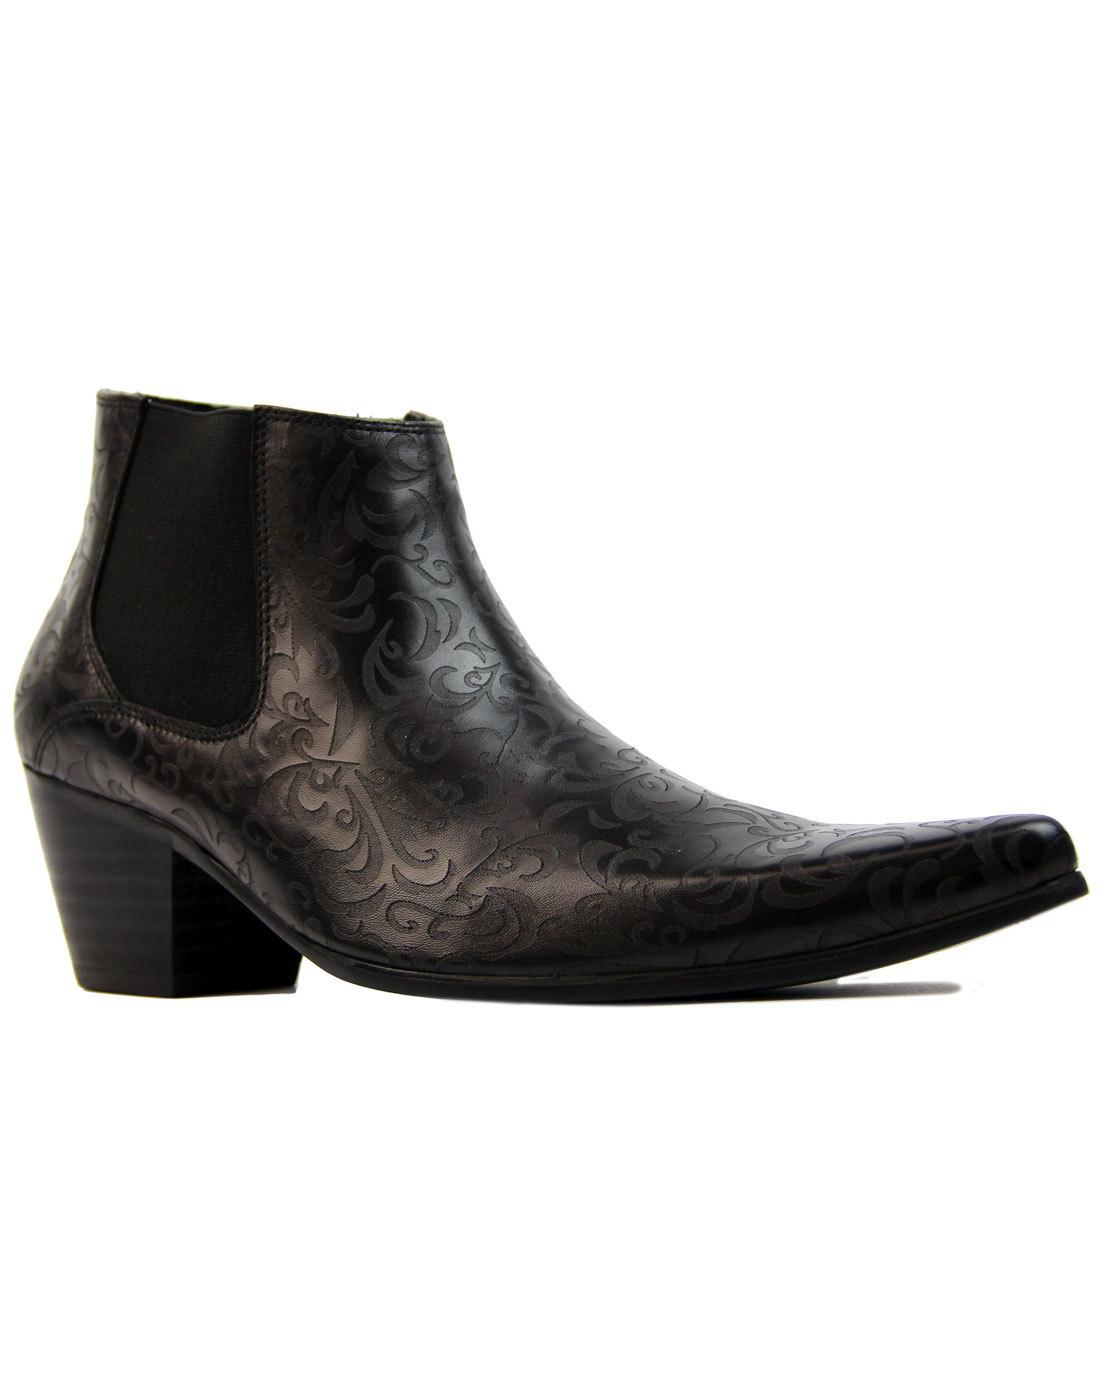 Vinnie MADCAP ENGLAND Paisley Cuban Chelsea Boots